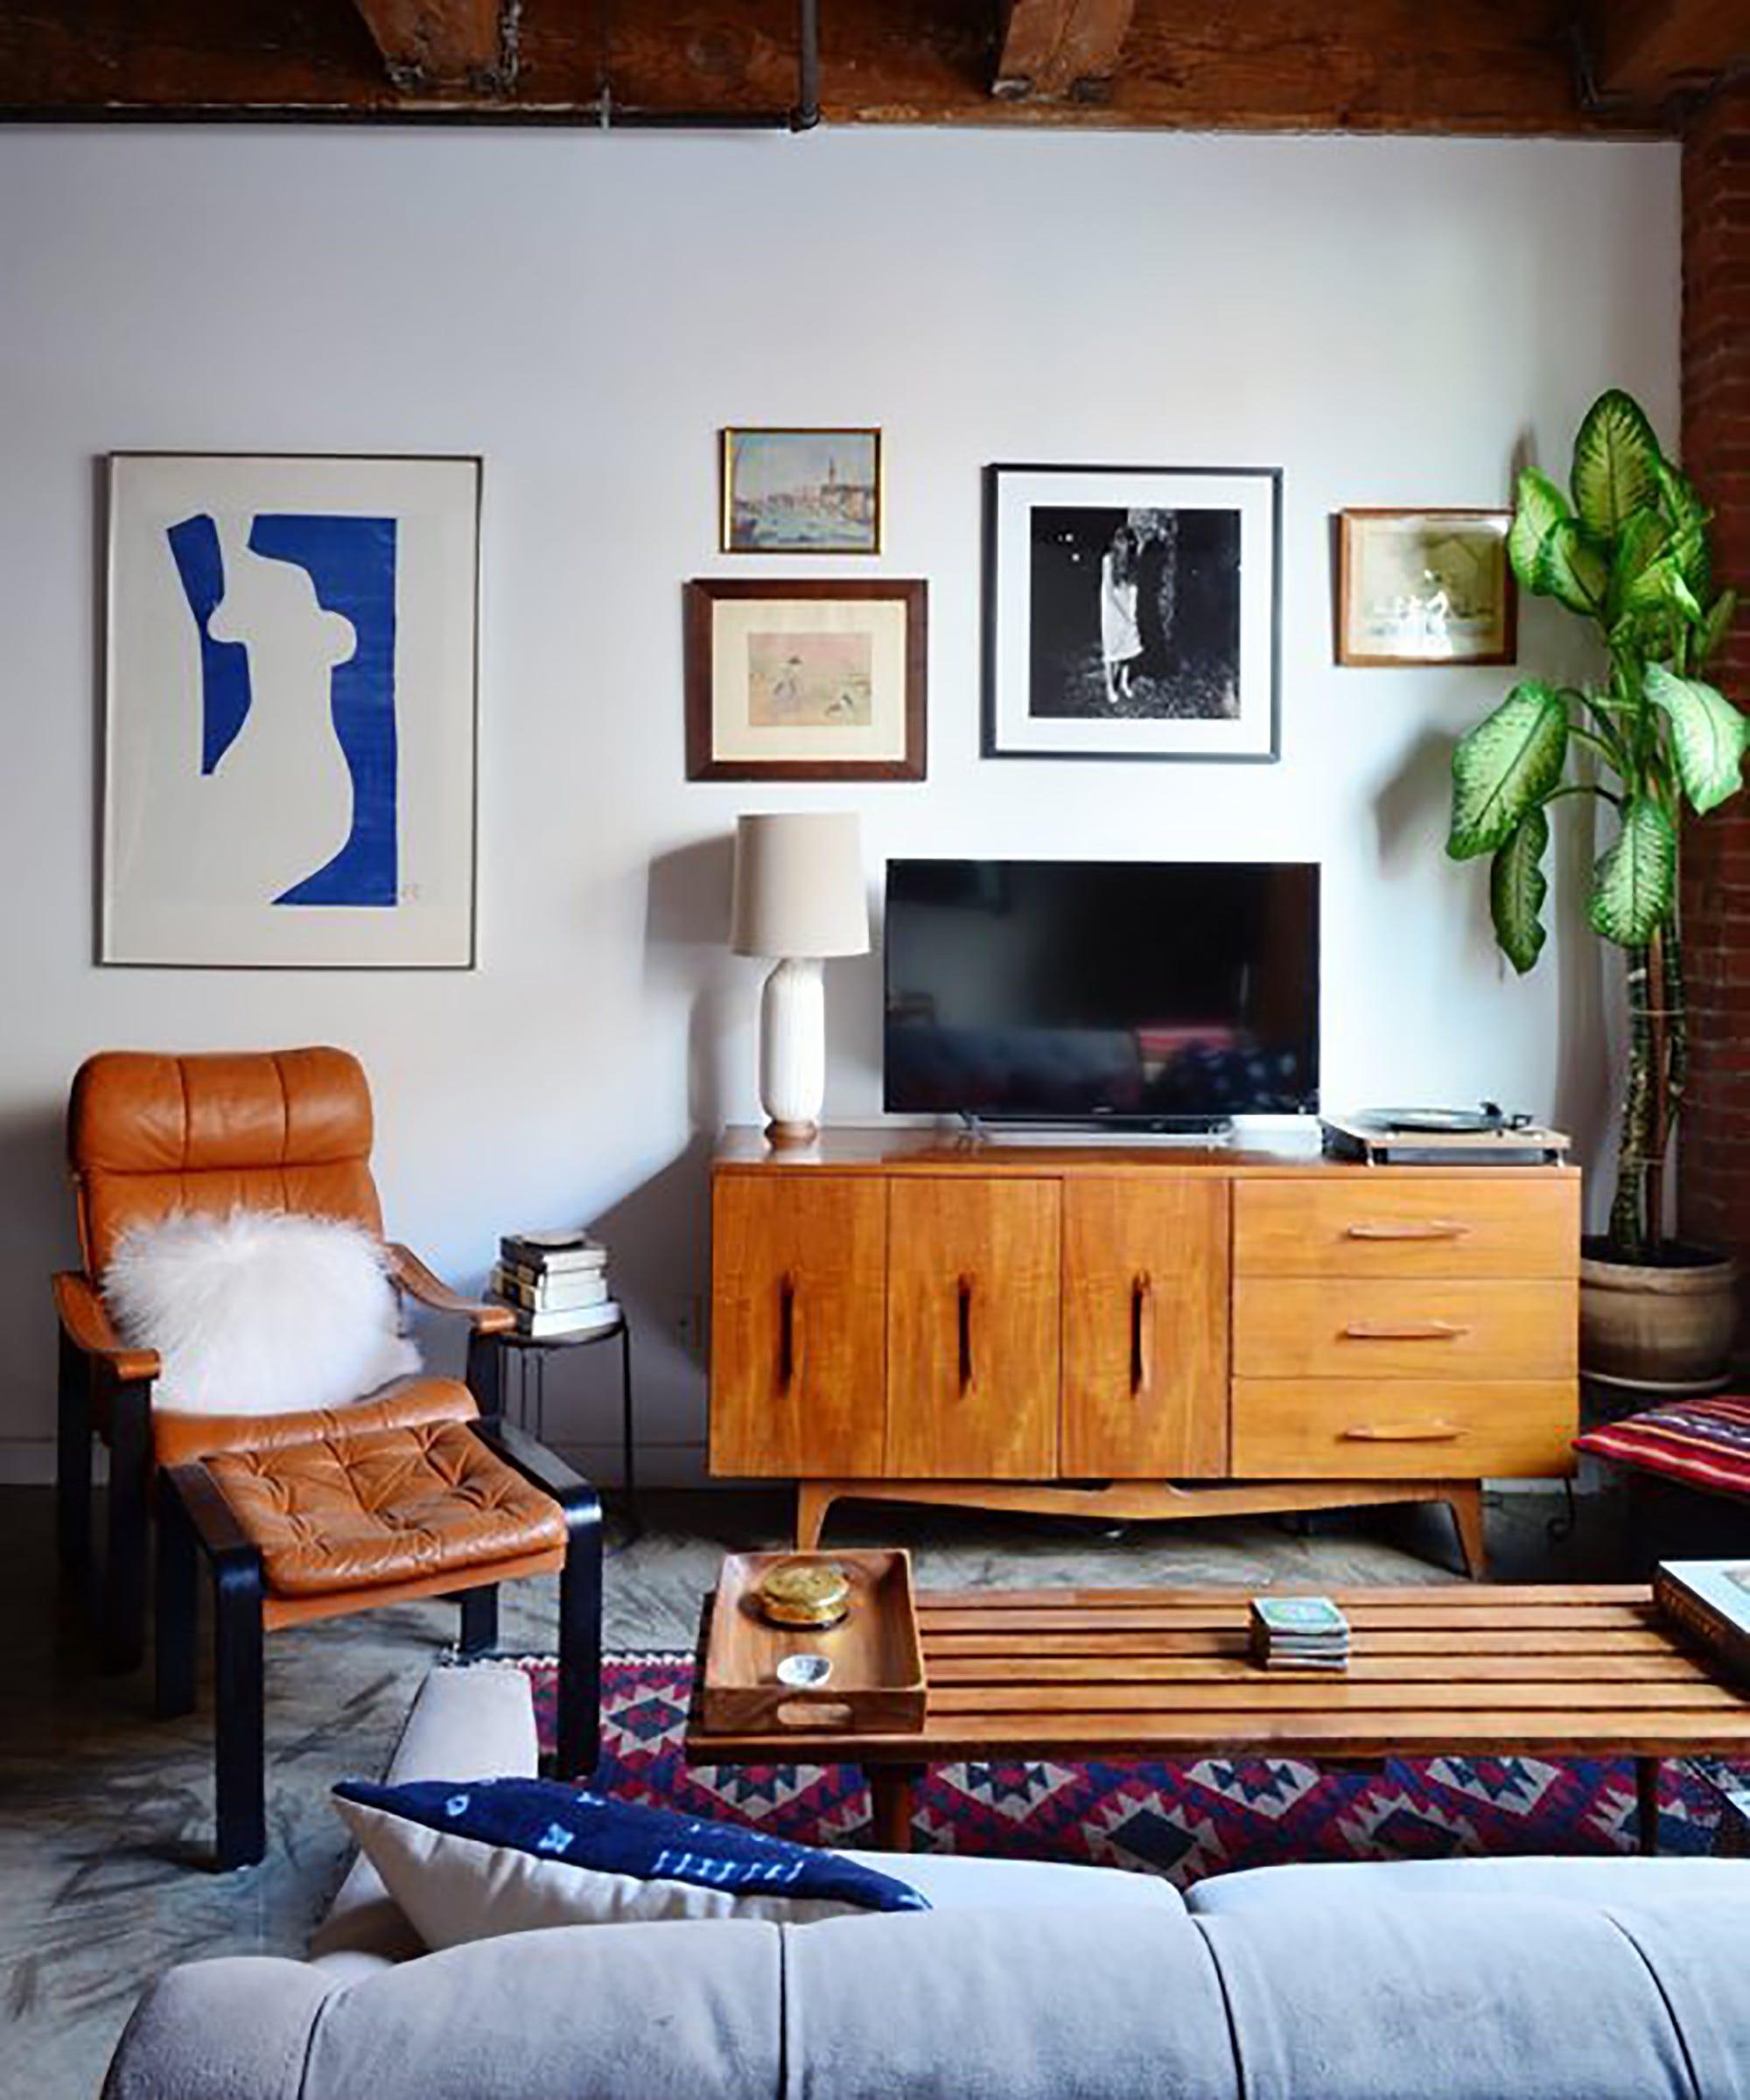 Brooklyn Studio Apartments: Brooklyn Studio Apartment Home Tour Video